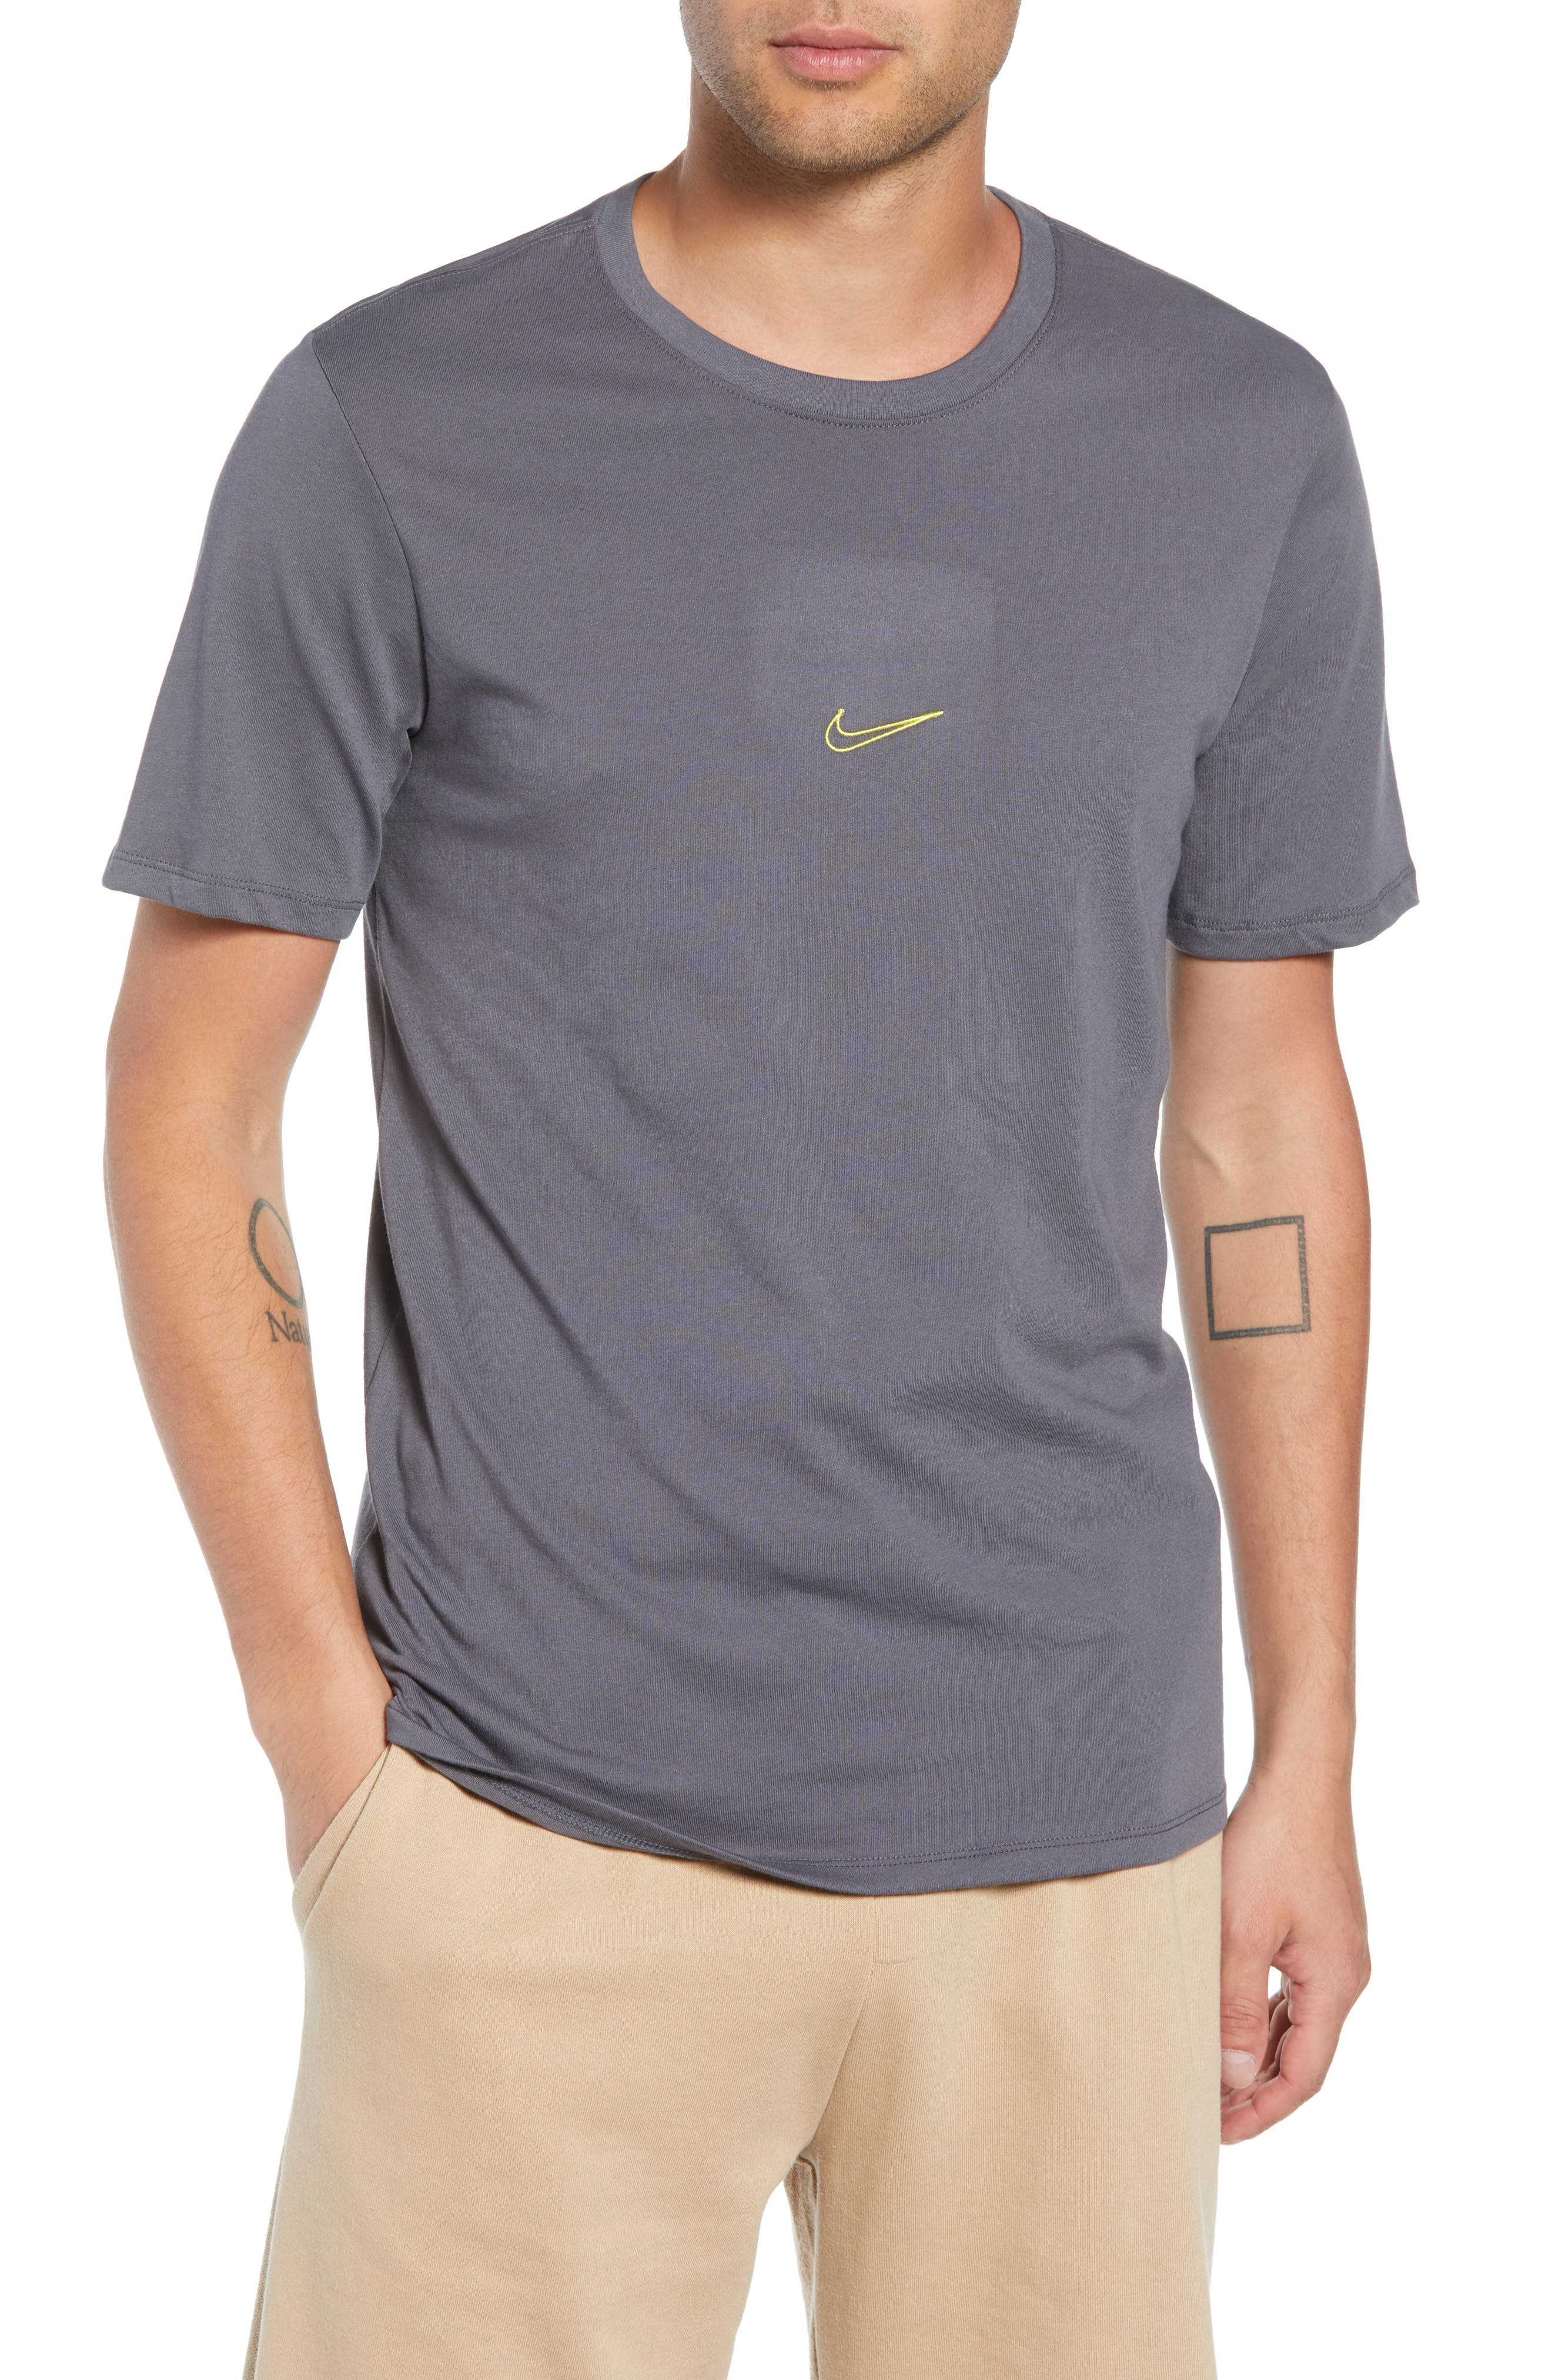 SB Dry Tropical Graphic T-Shirt,                         Main,                         color, Dark Grey/ Dynamic Yellow